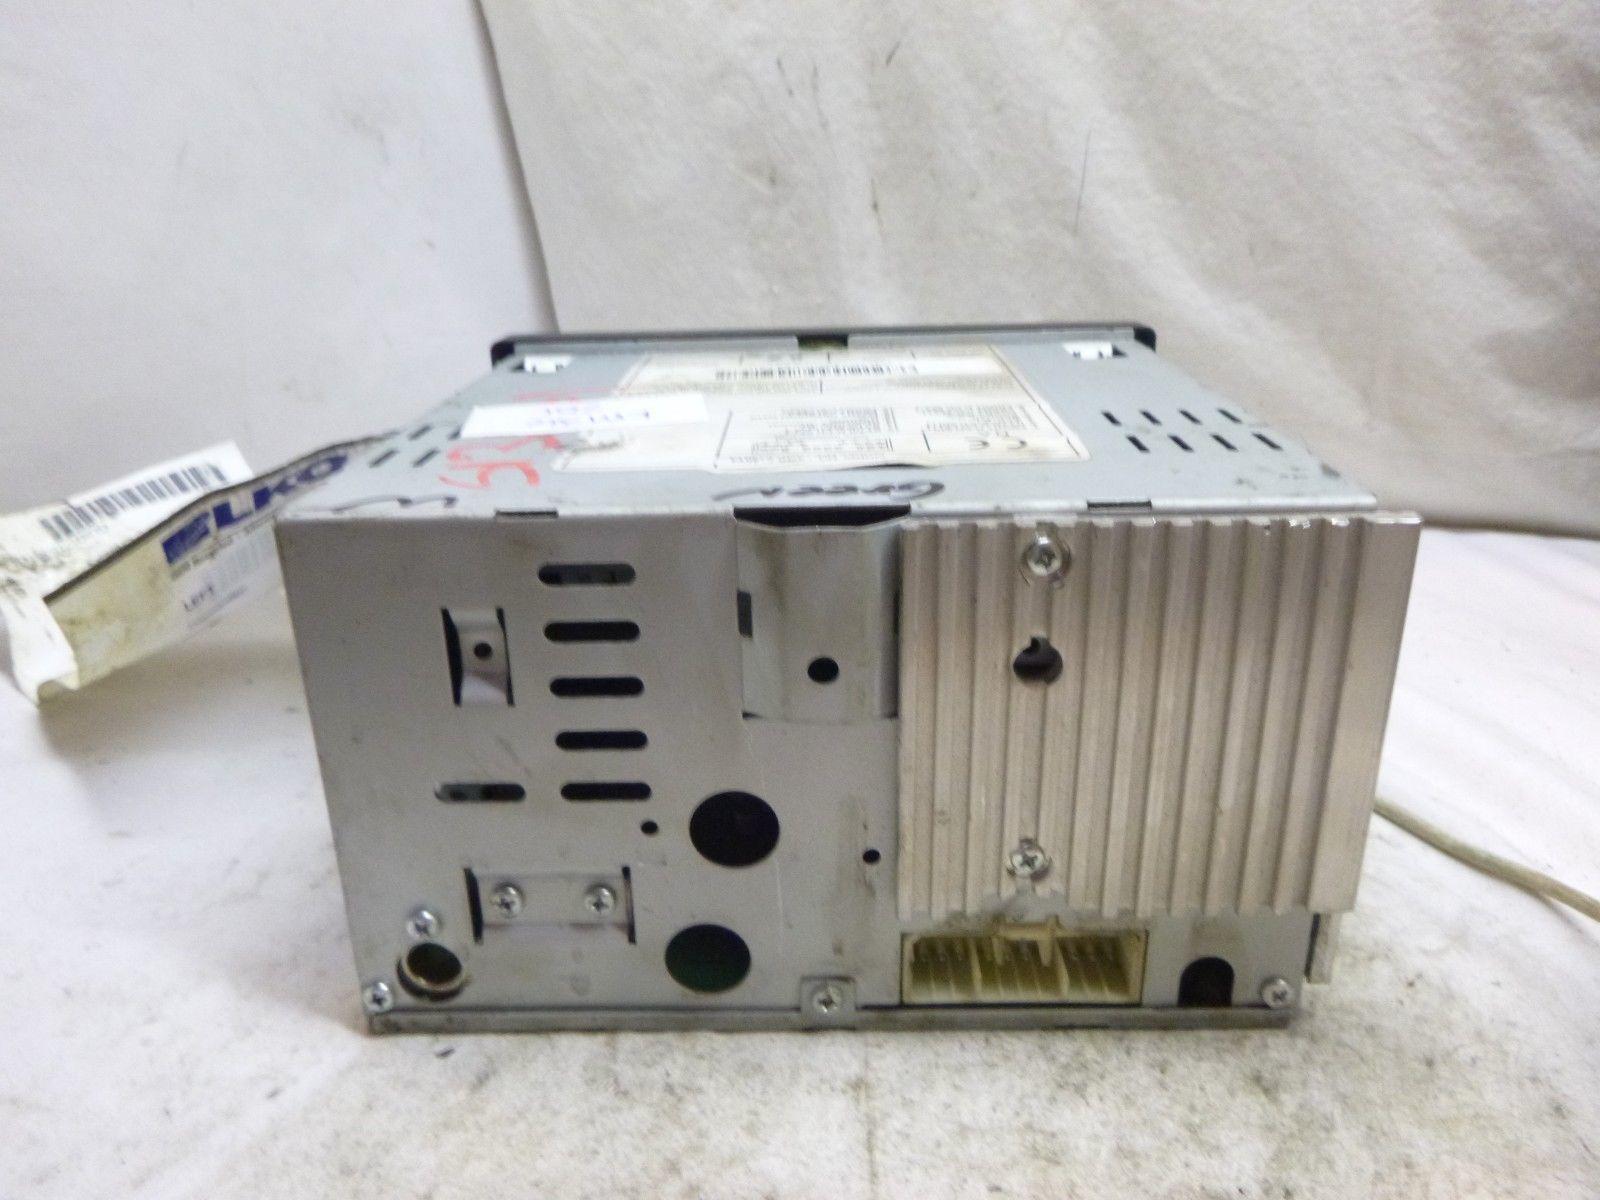 08 2008 Chevrolet Aveo Radio Cd MP3 Player 96889897 KM36